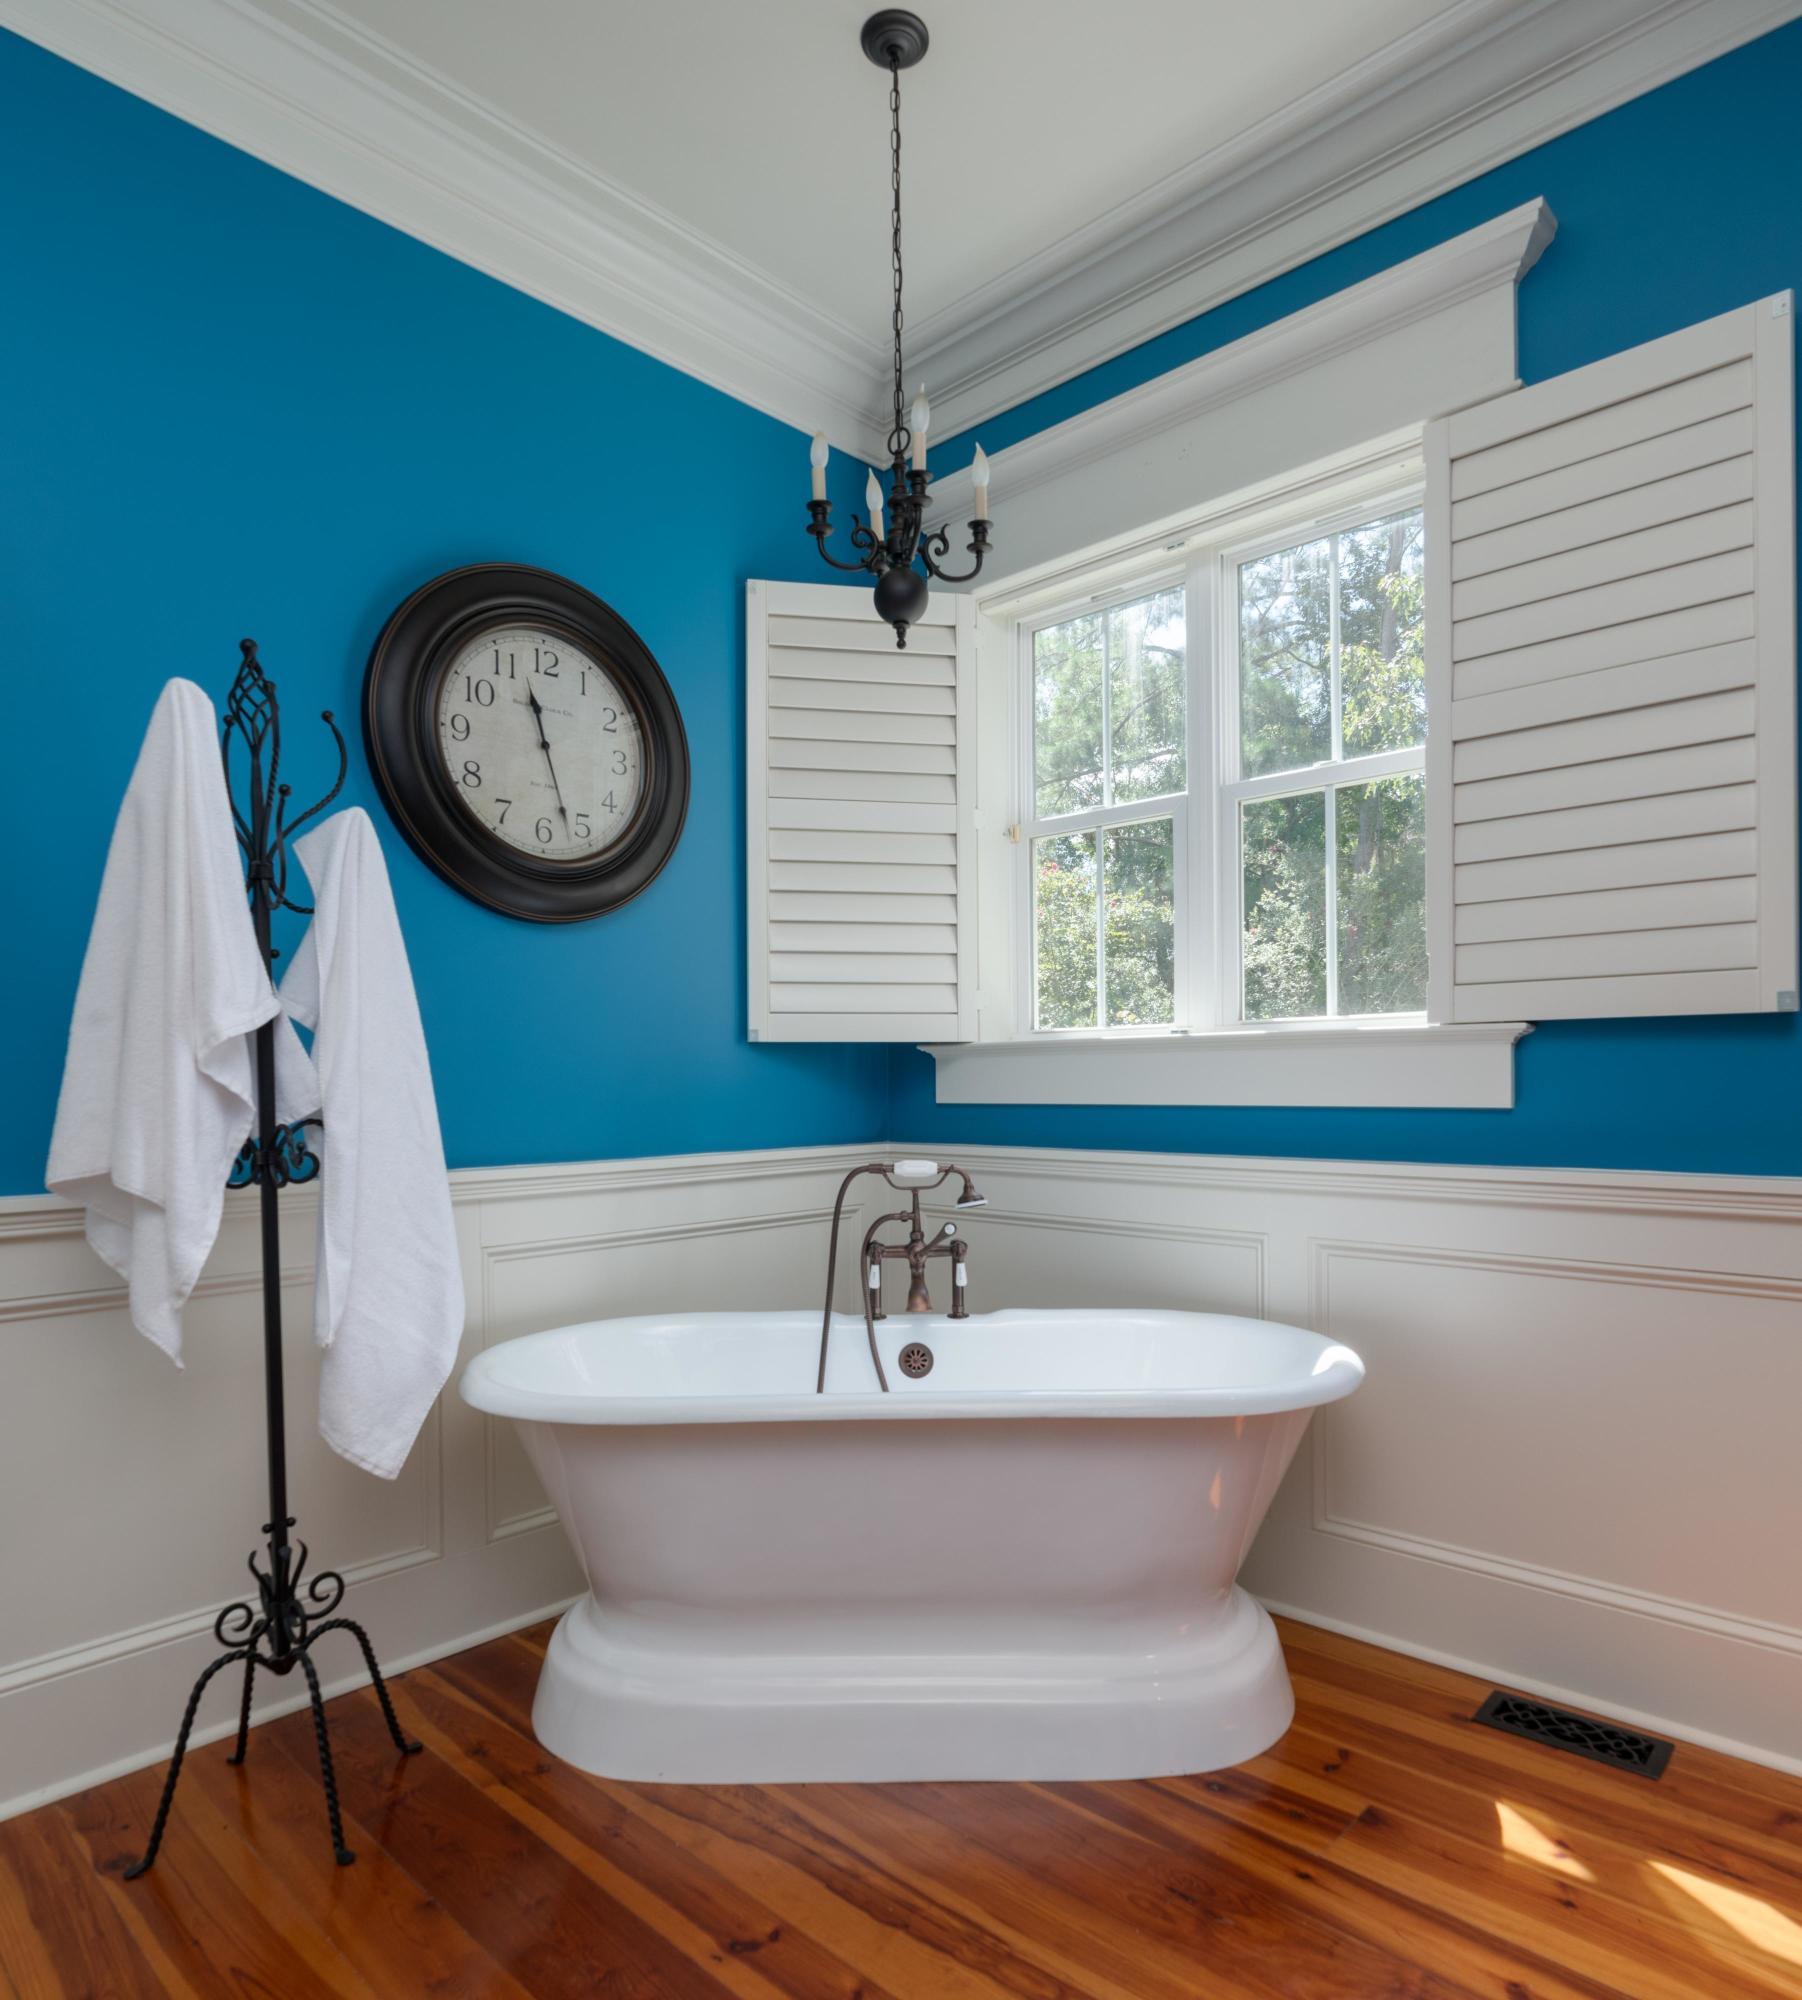 Broughton Hall Homes For Sale - 2058 Lakeshore, Pinopolis, SC - 2